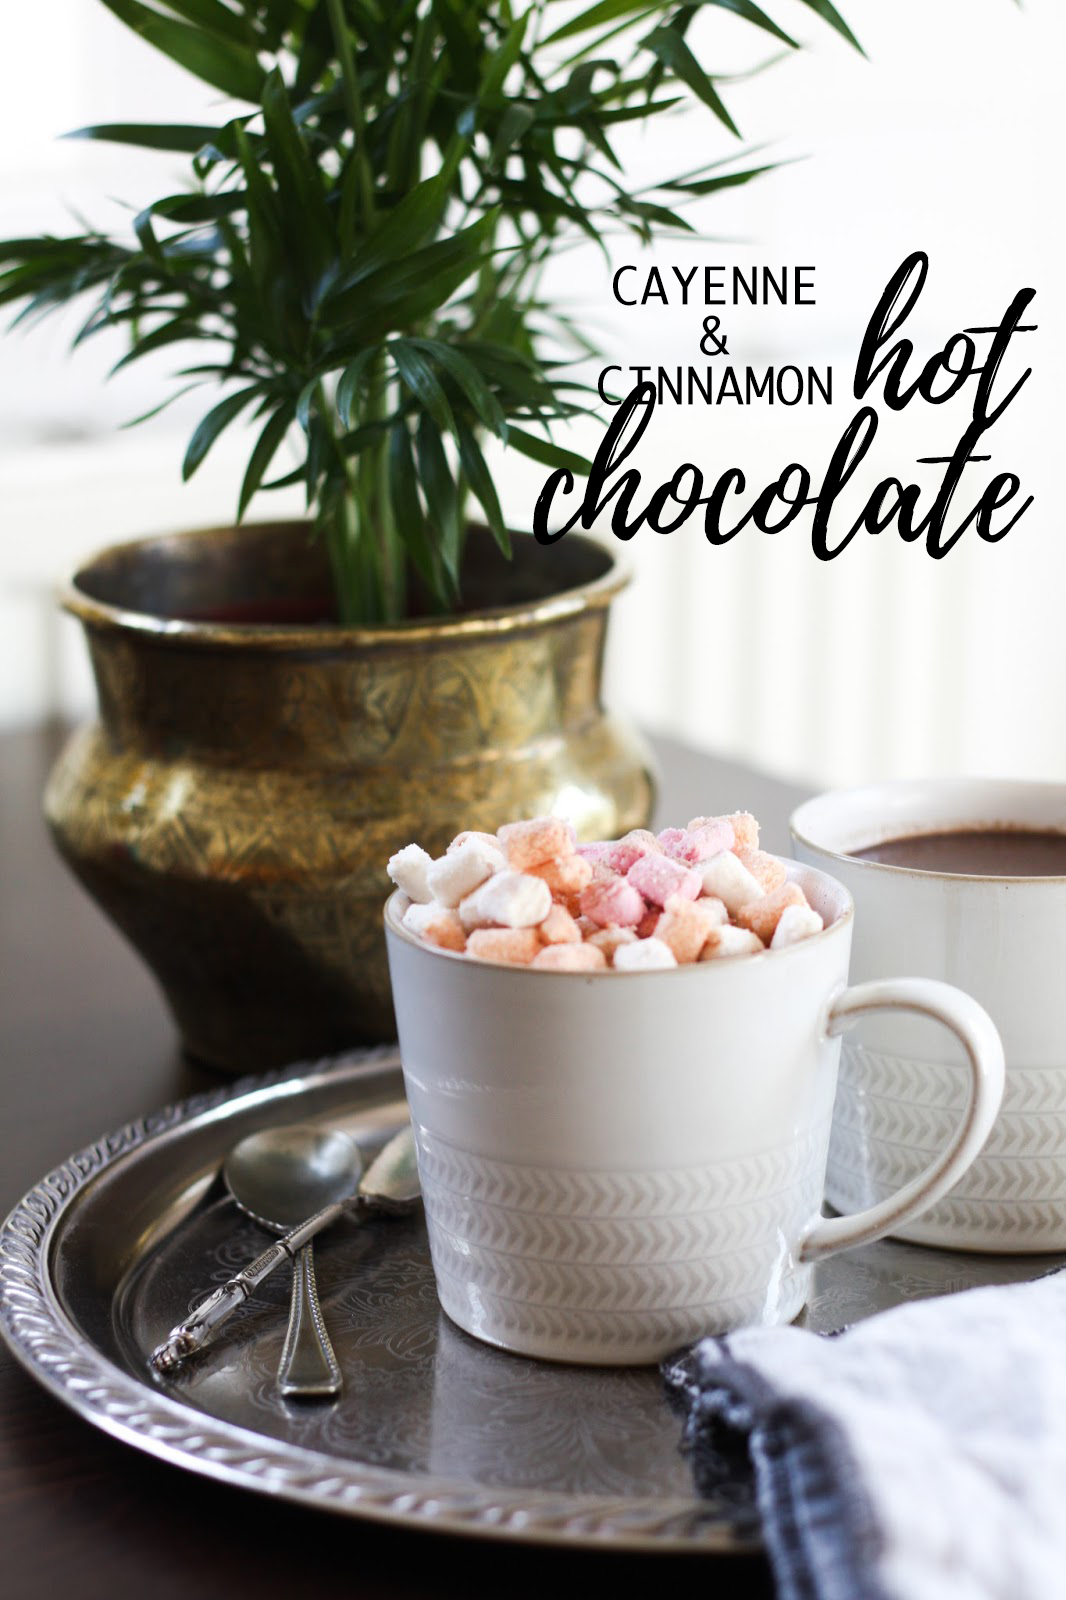 Cayenne & cinnamon hot chocolate